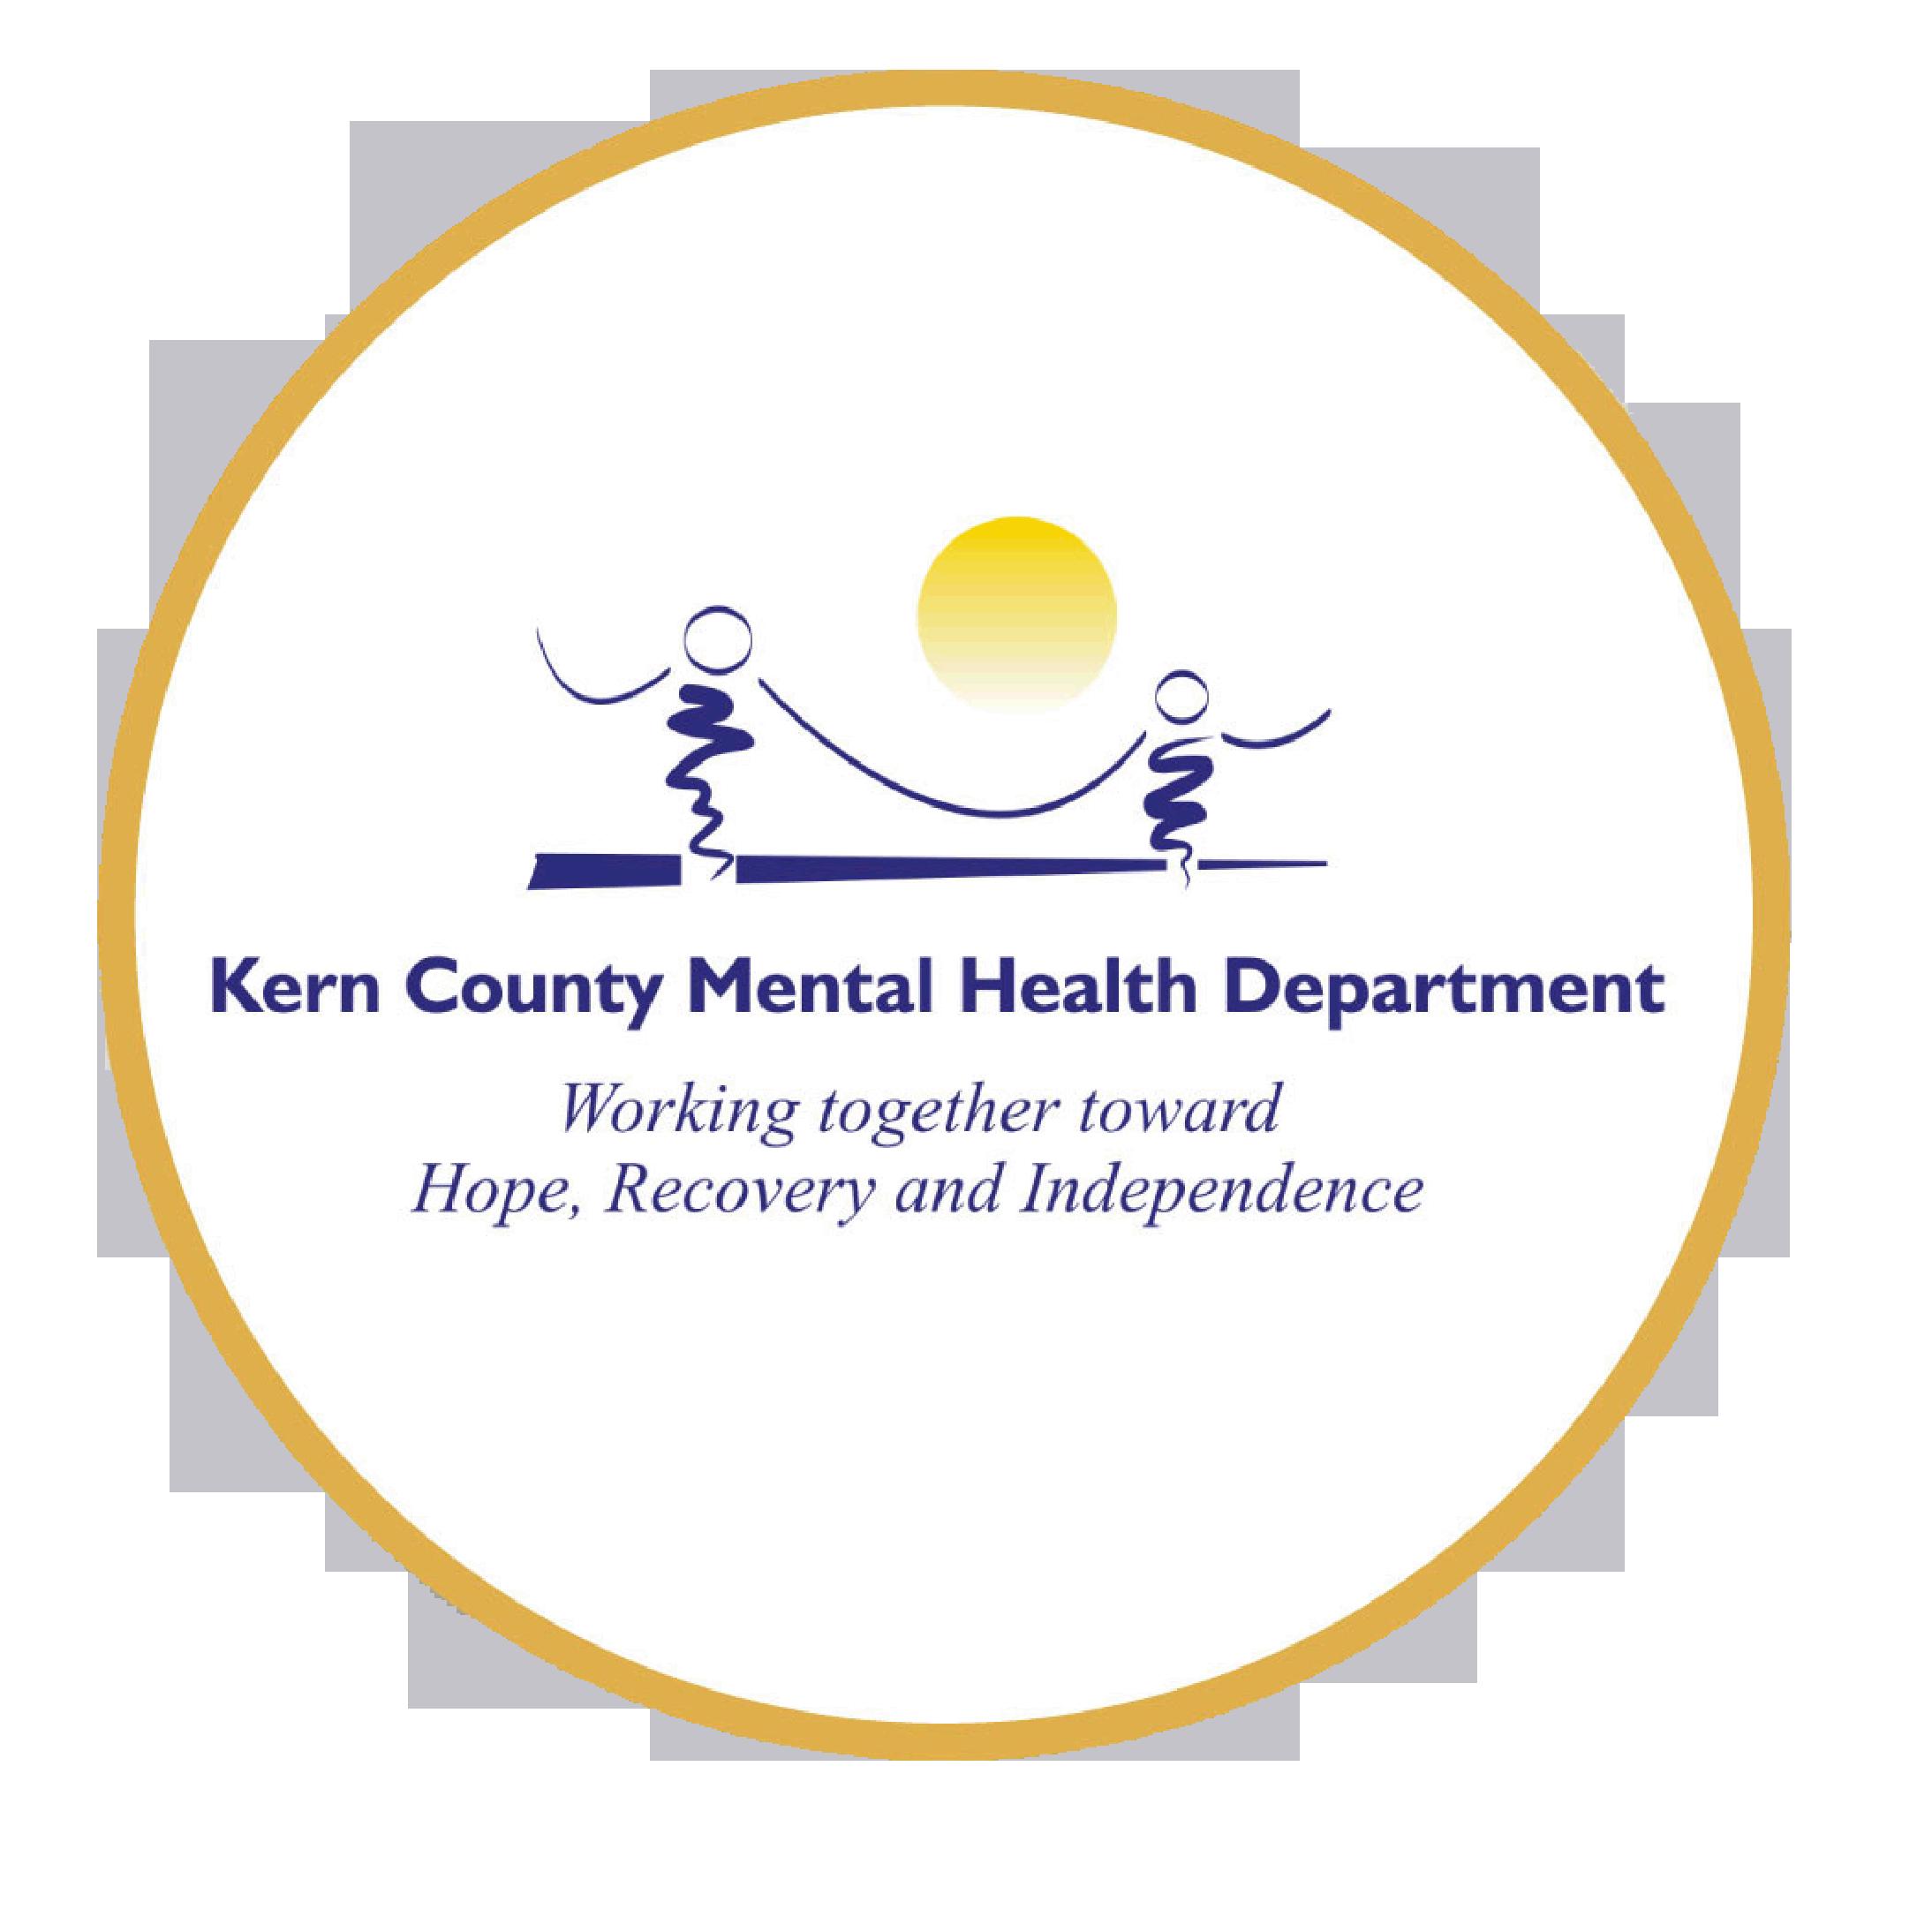 KCMH Logo w Dept Name